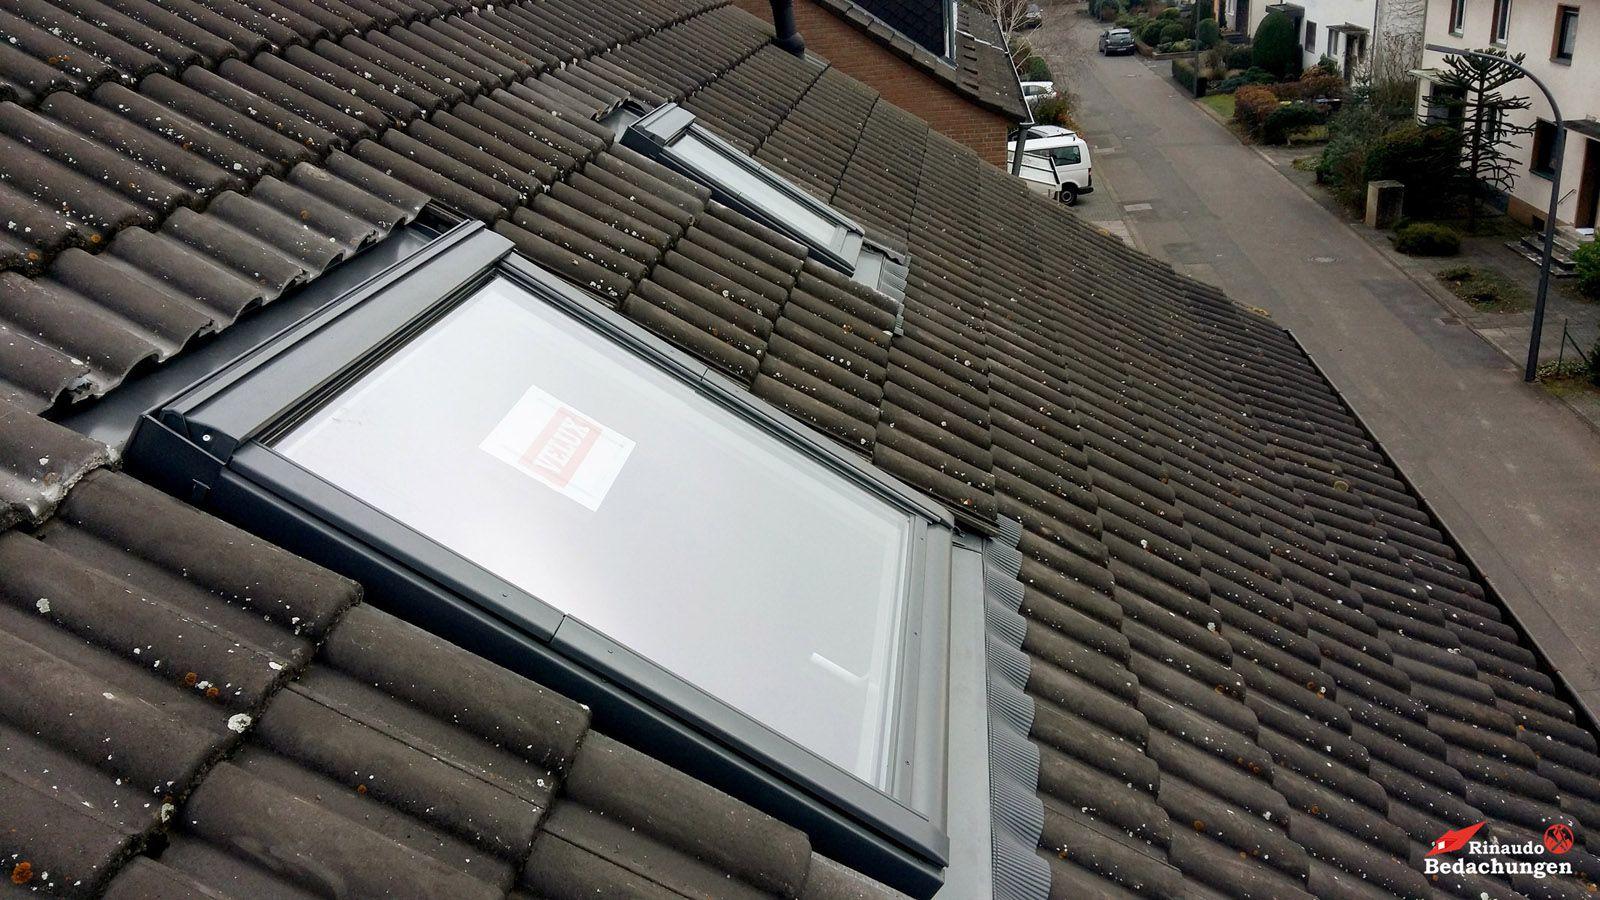 dachfenstereinbau - rinaudo bedachungen, dachdecker köln